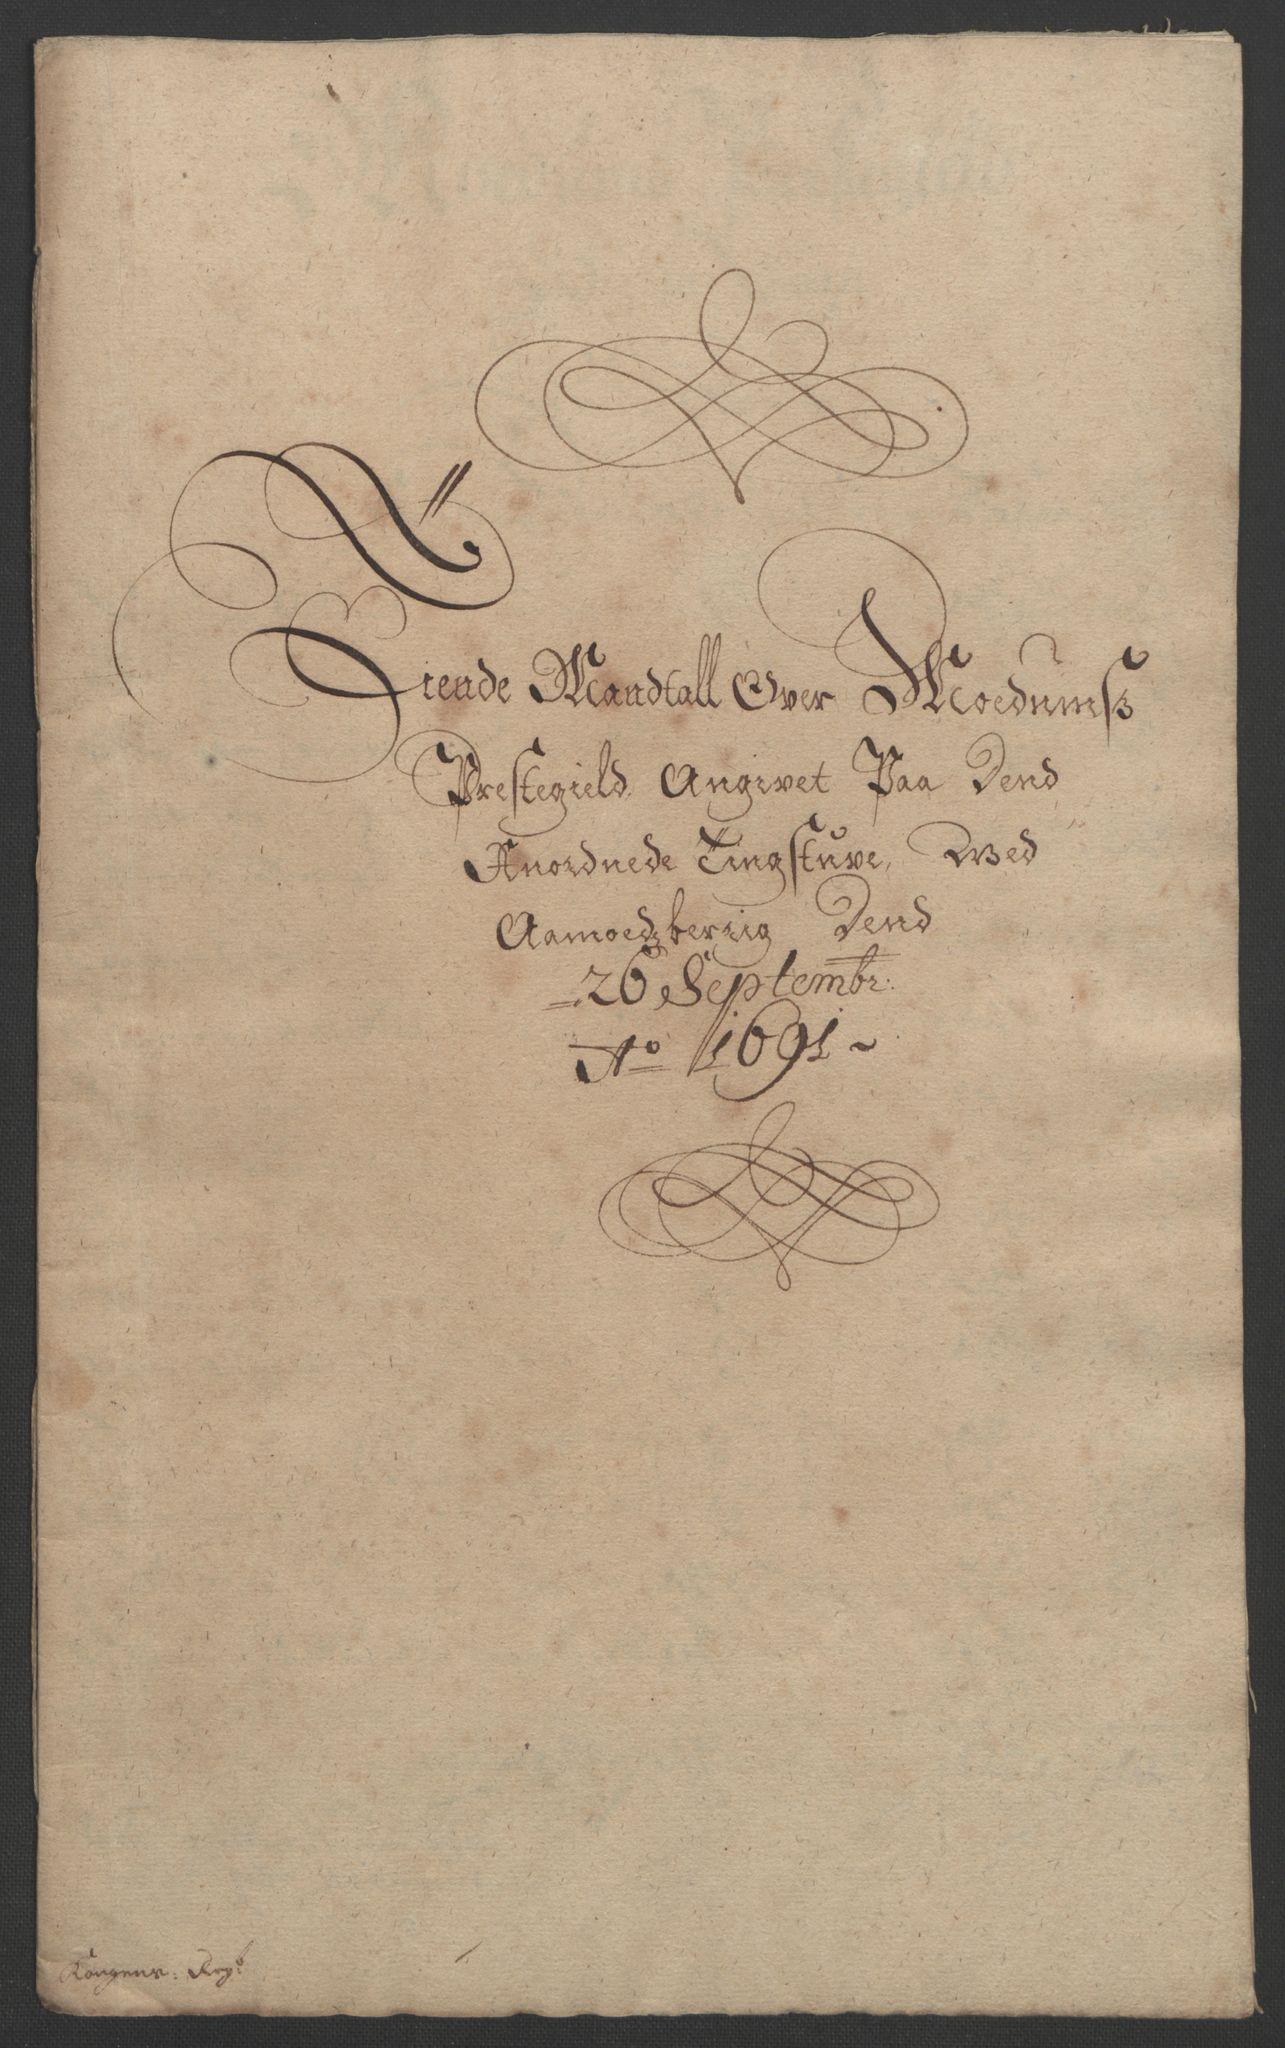 RA, Rentekammeret inntil 1814, Reviderte regnskaper, Fogderegnskap, R25/L1681: Fogderegnskap Buskerud, 1691-1692, s. 37